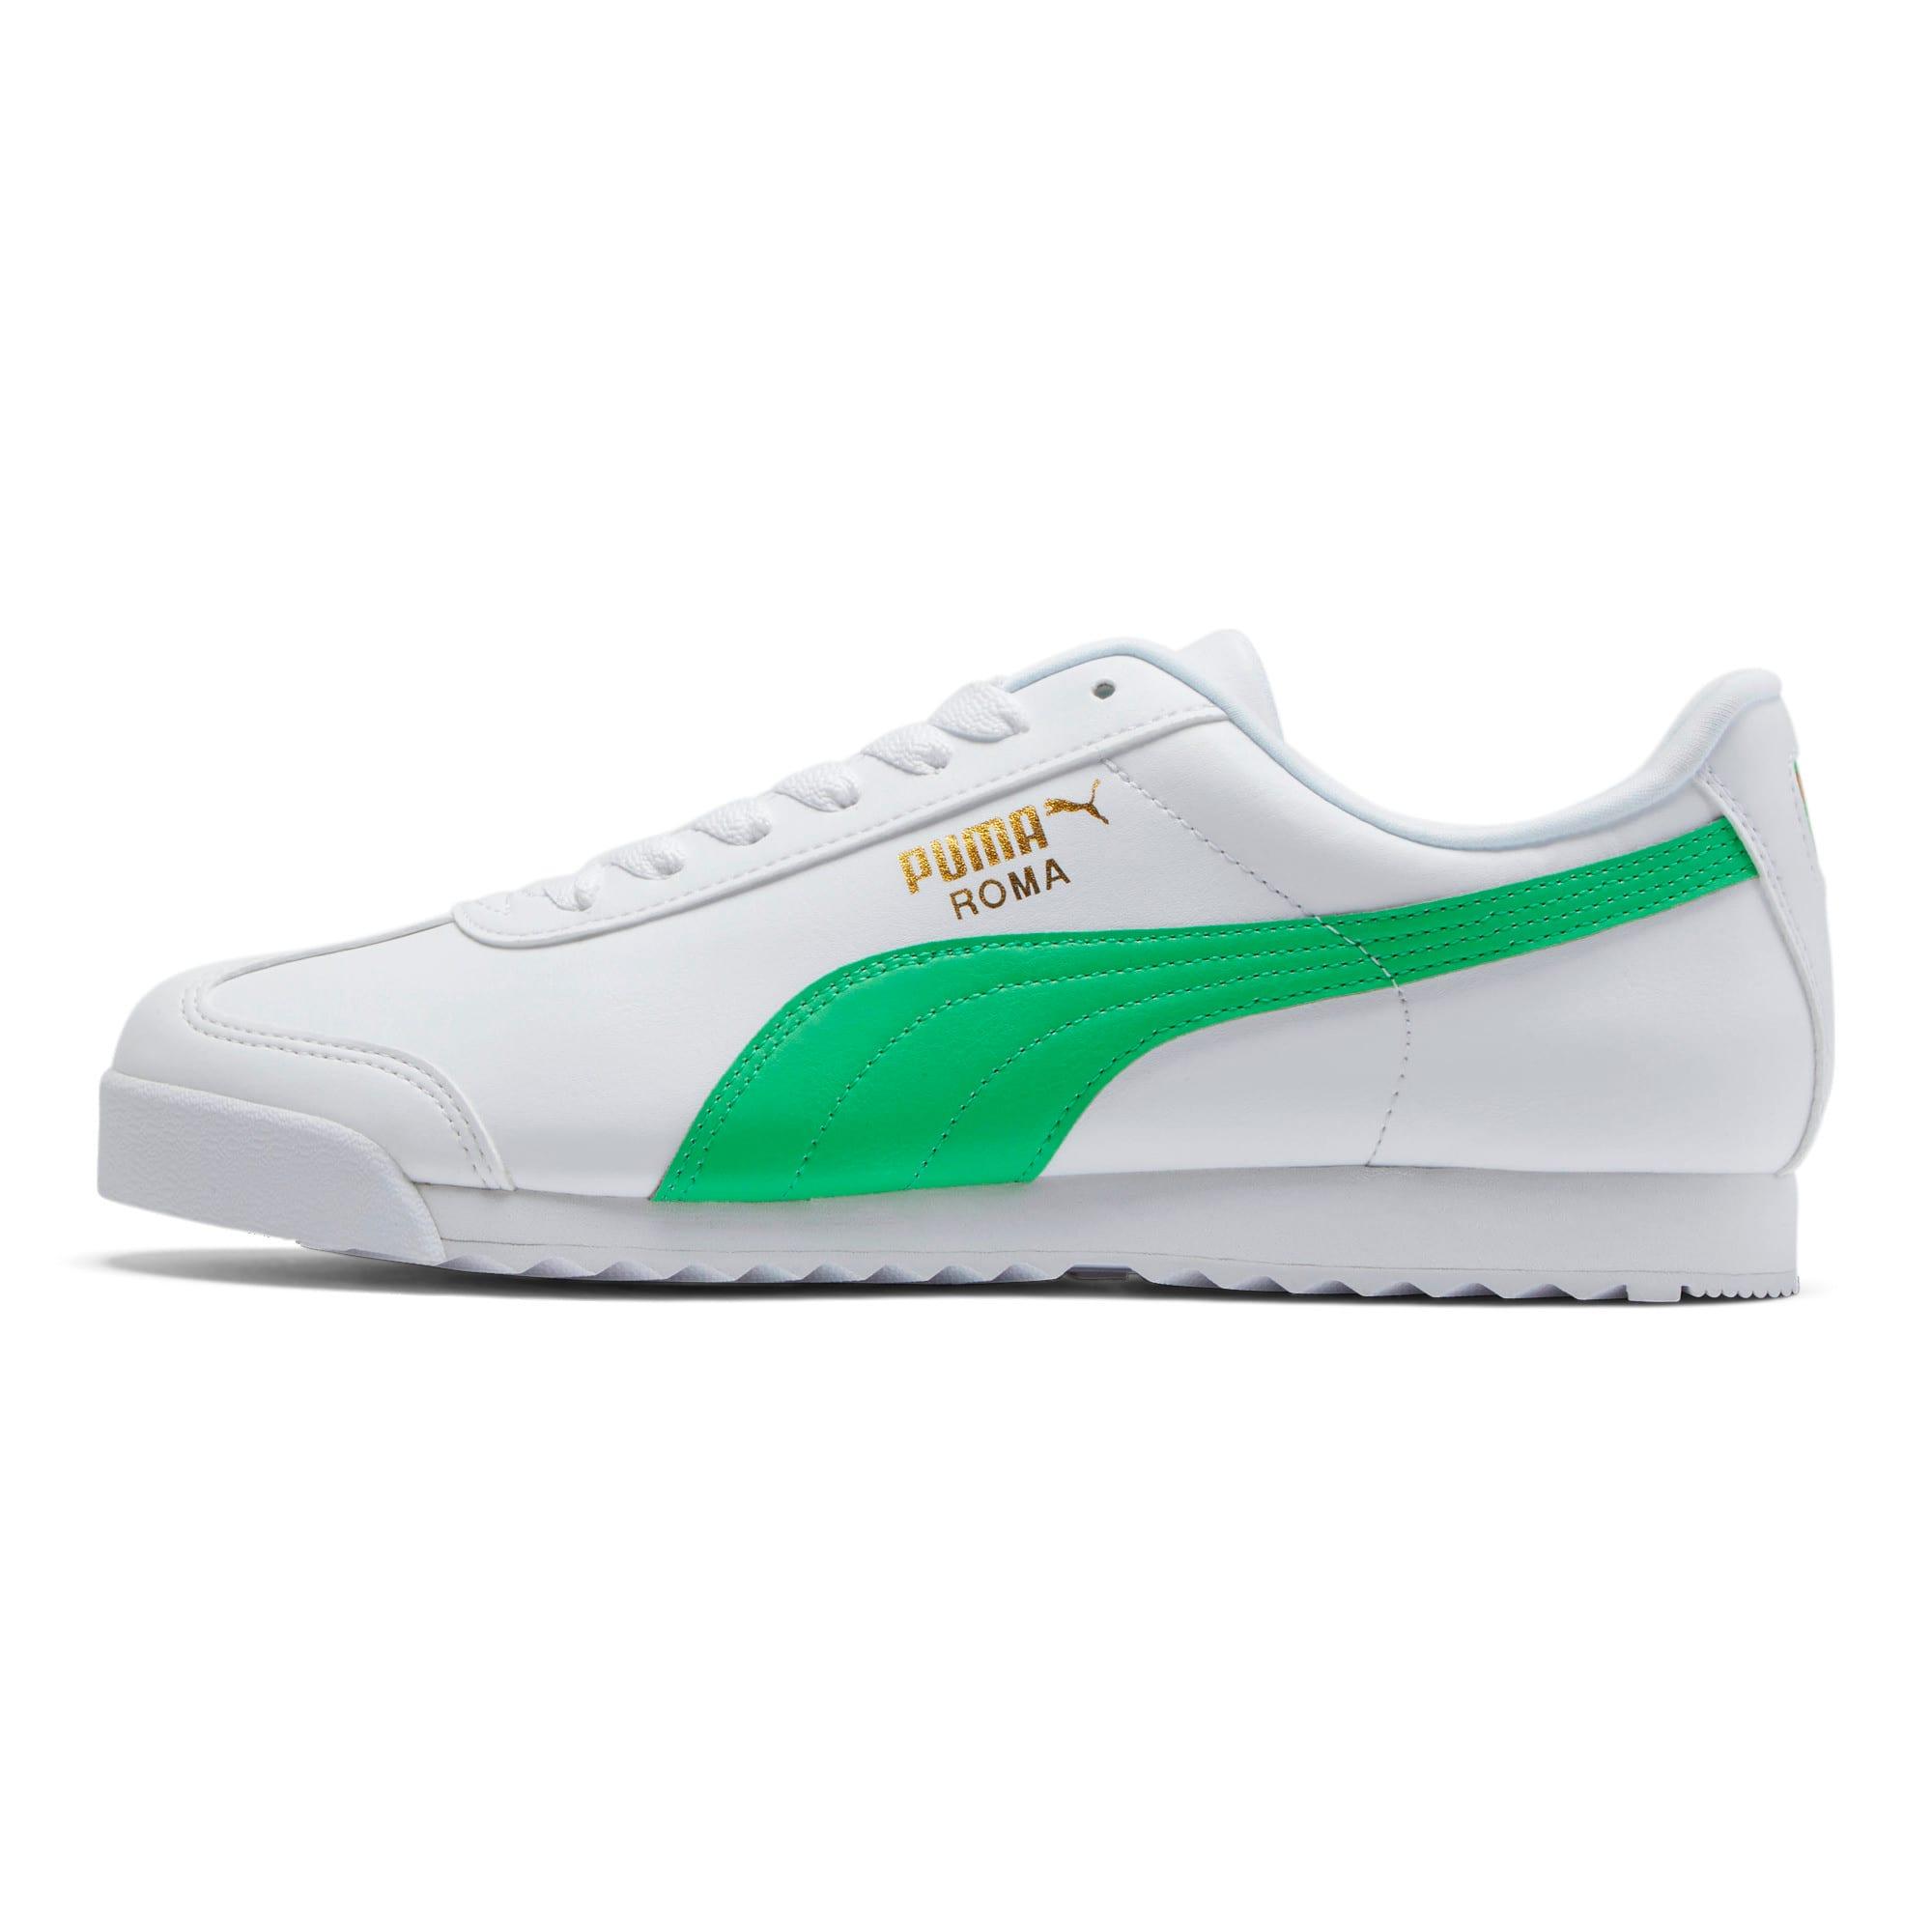 Miniatura 1 de Zapatos deportivos Roma Basic +, Puma White-Irish Green, mediano